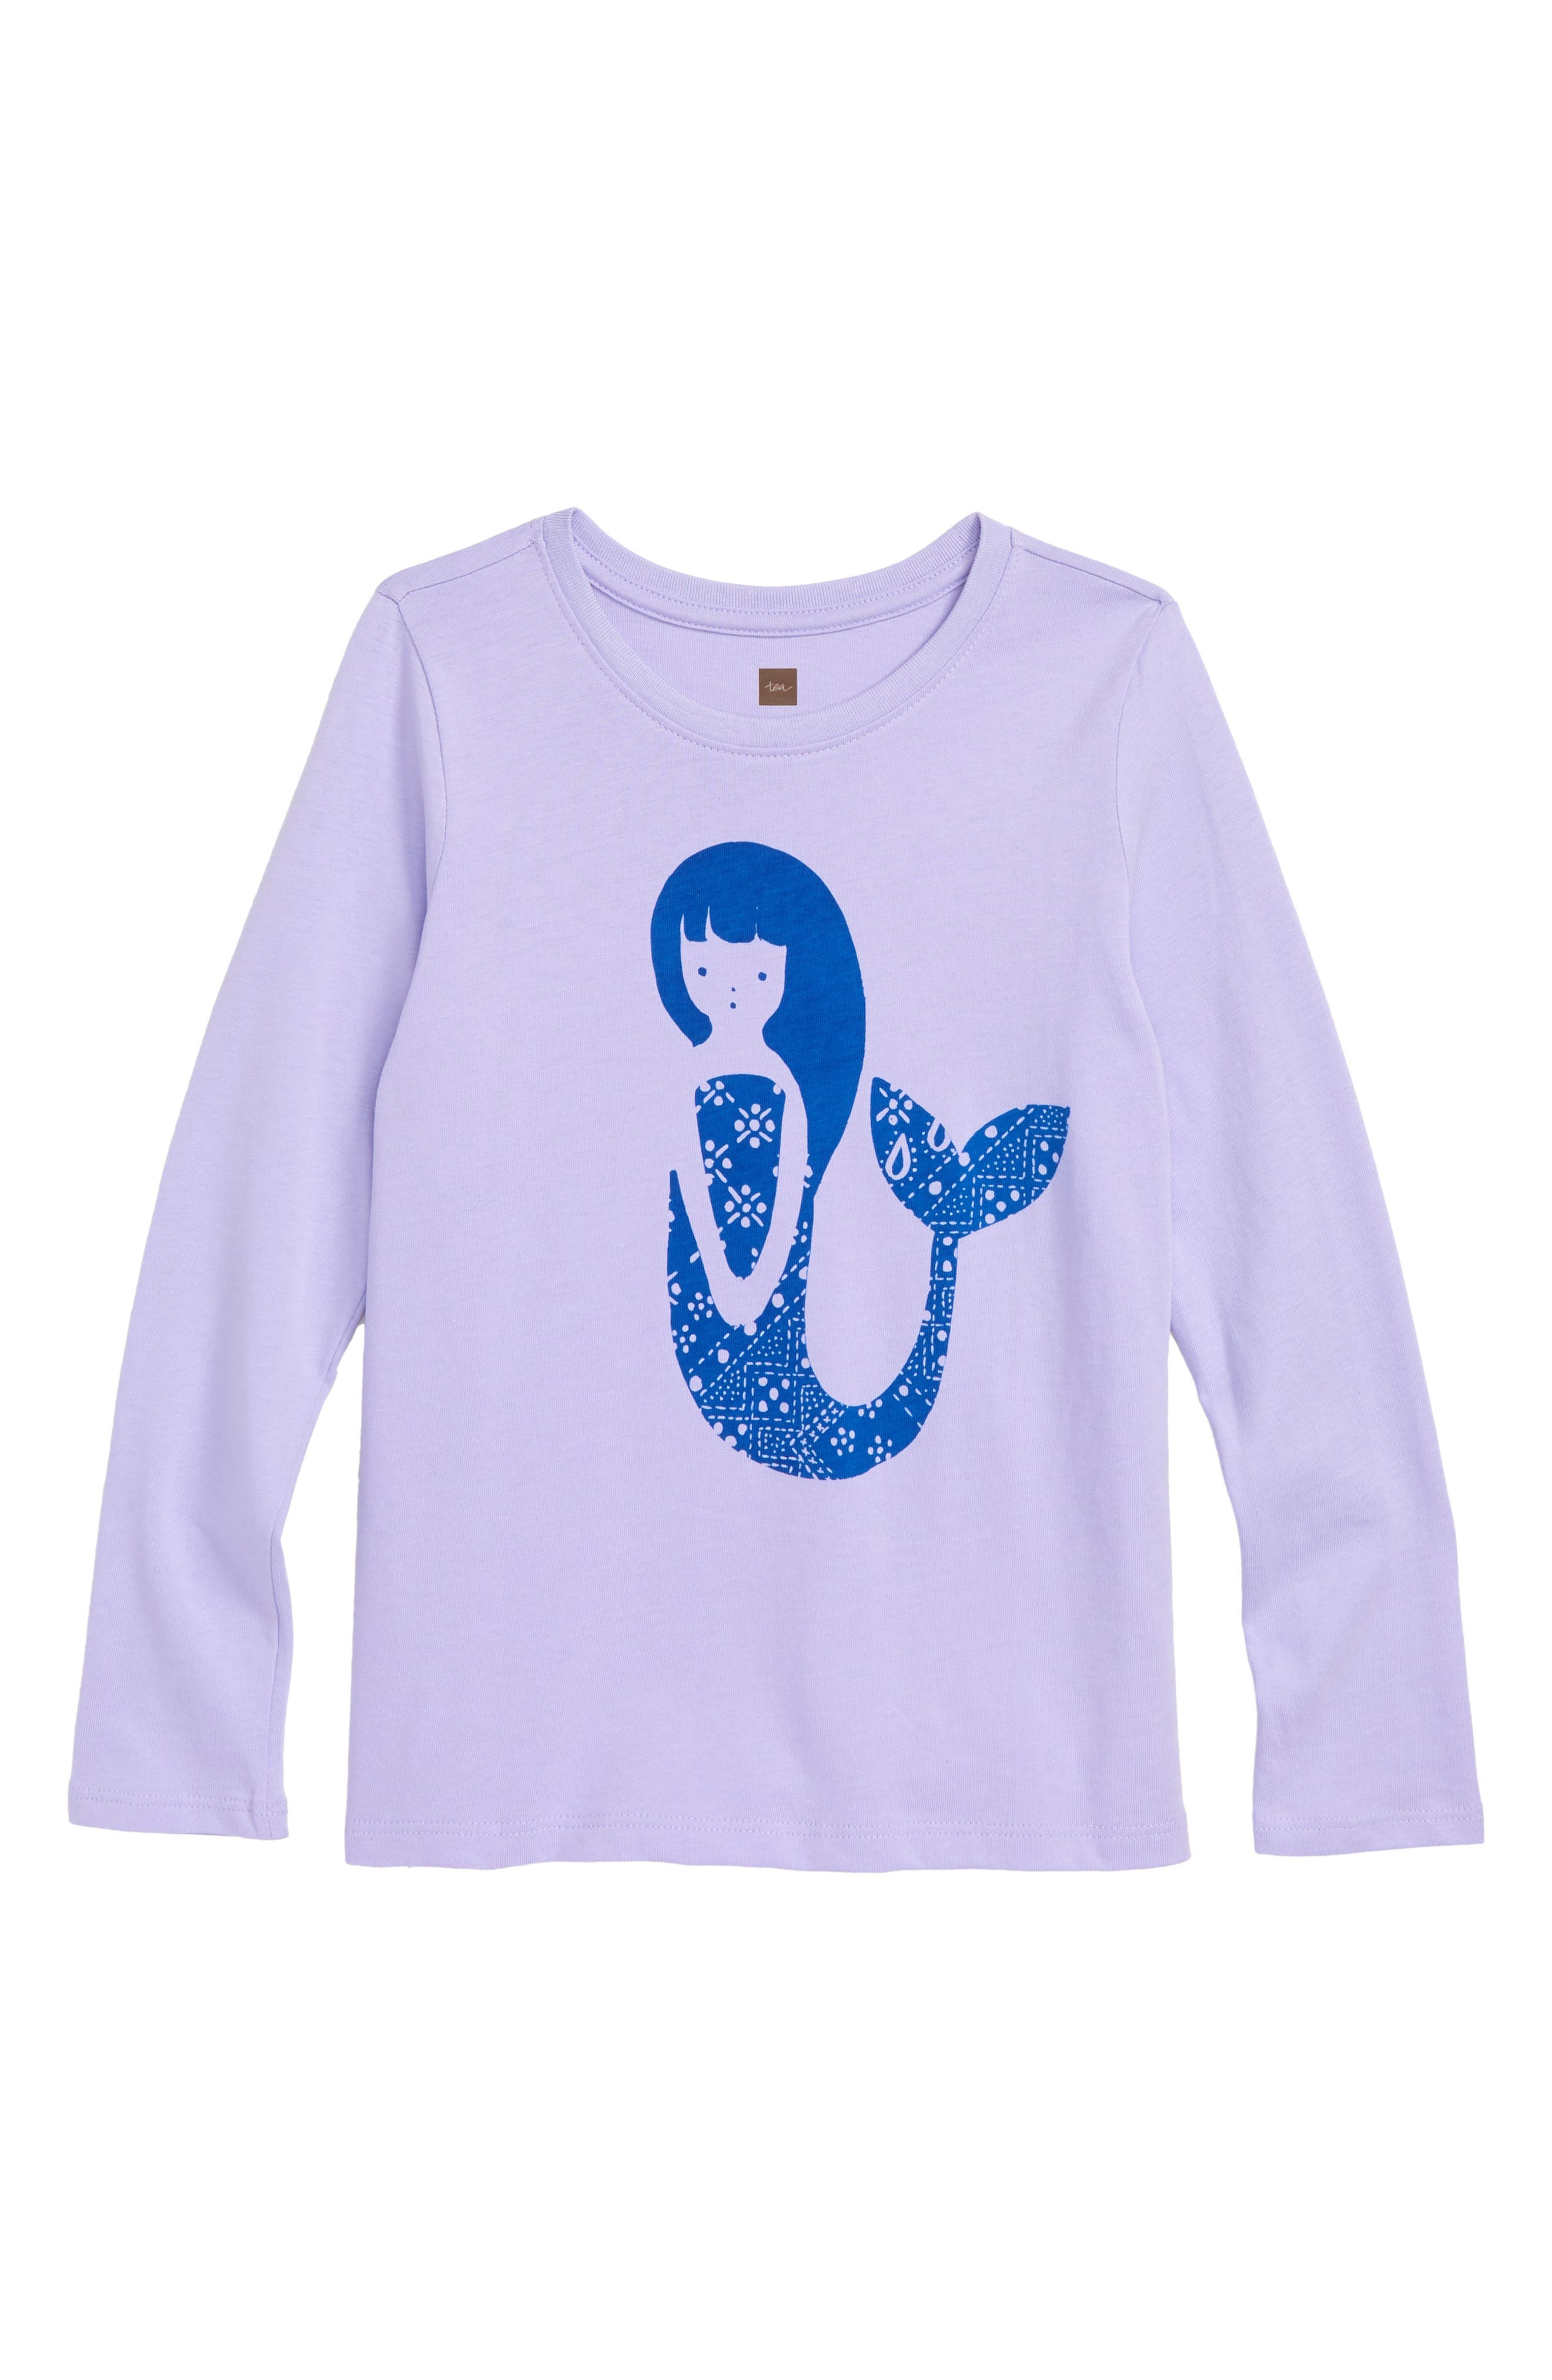 Mermaid Graphic Tee,                             Main thumbnail 1, color,                             500